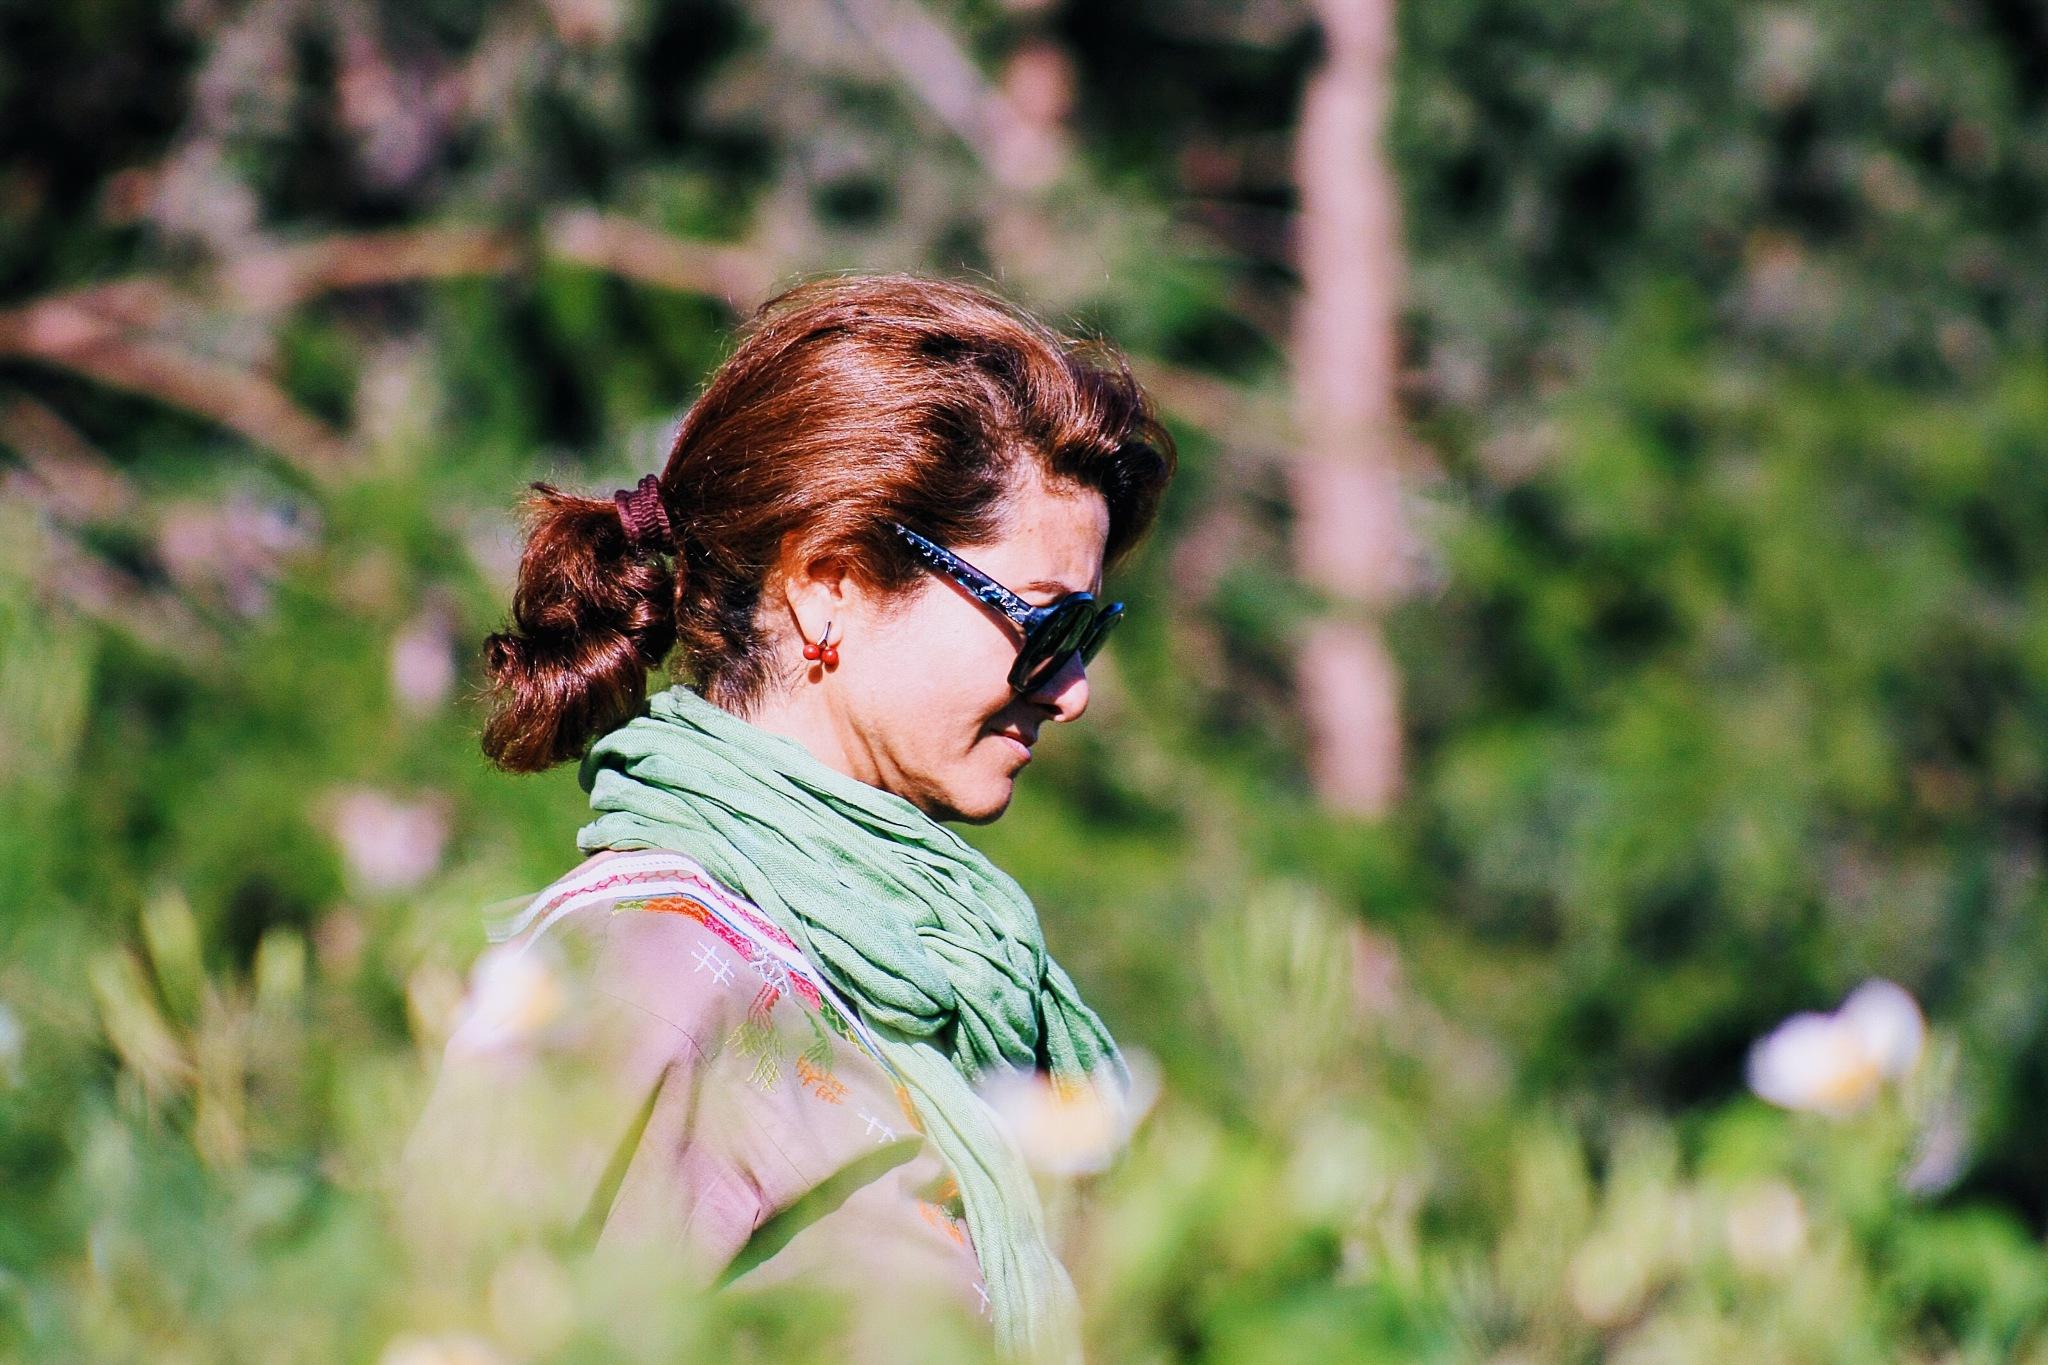 Lady In Focus  by houcemdean